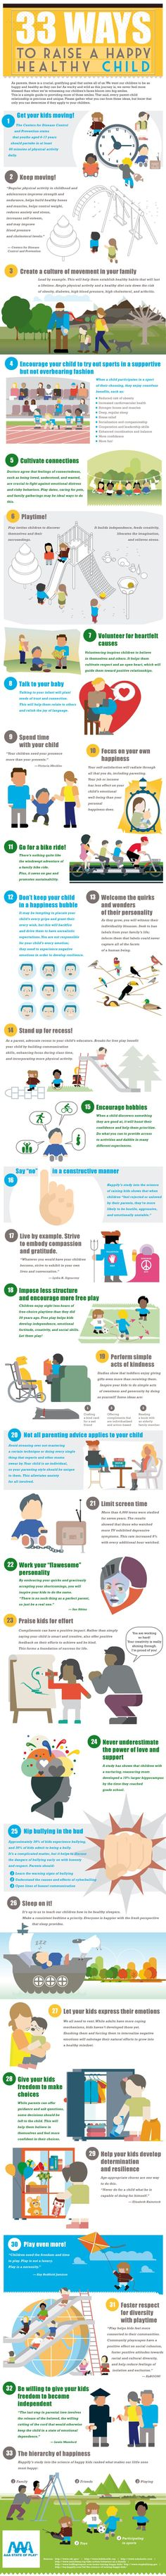 33 Ways to Raise a Happy Health Child !